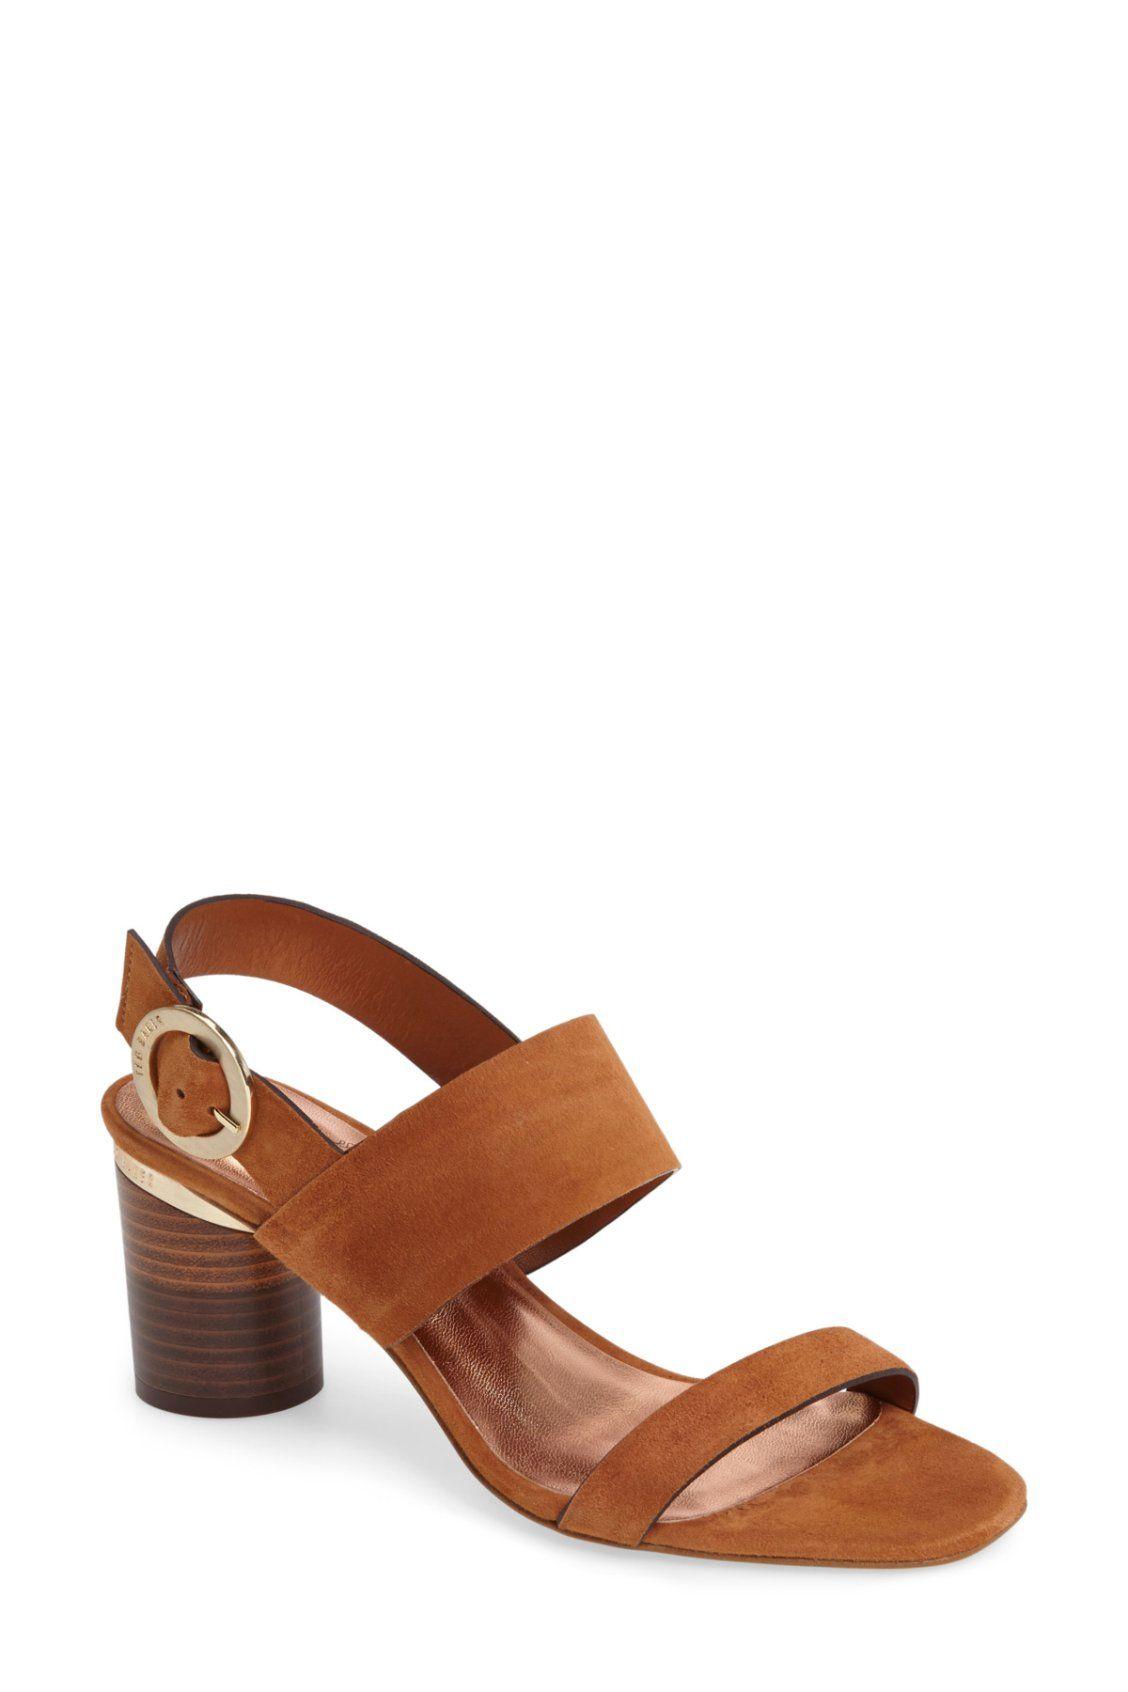 bd4e3d45dfd3c Classic tan Ted Baker London Azmara Sandals